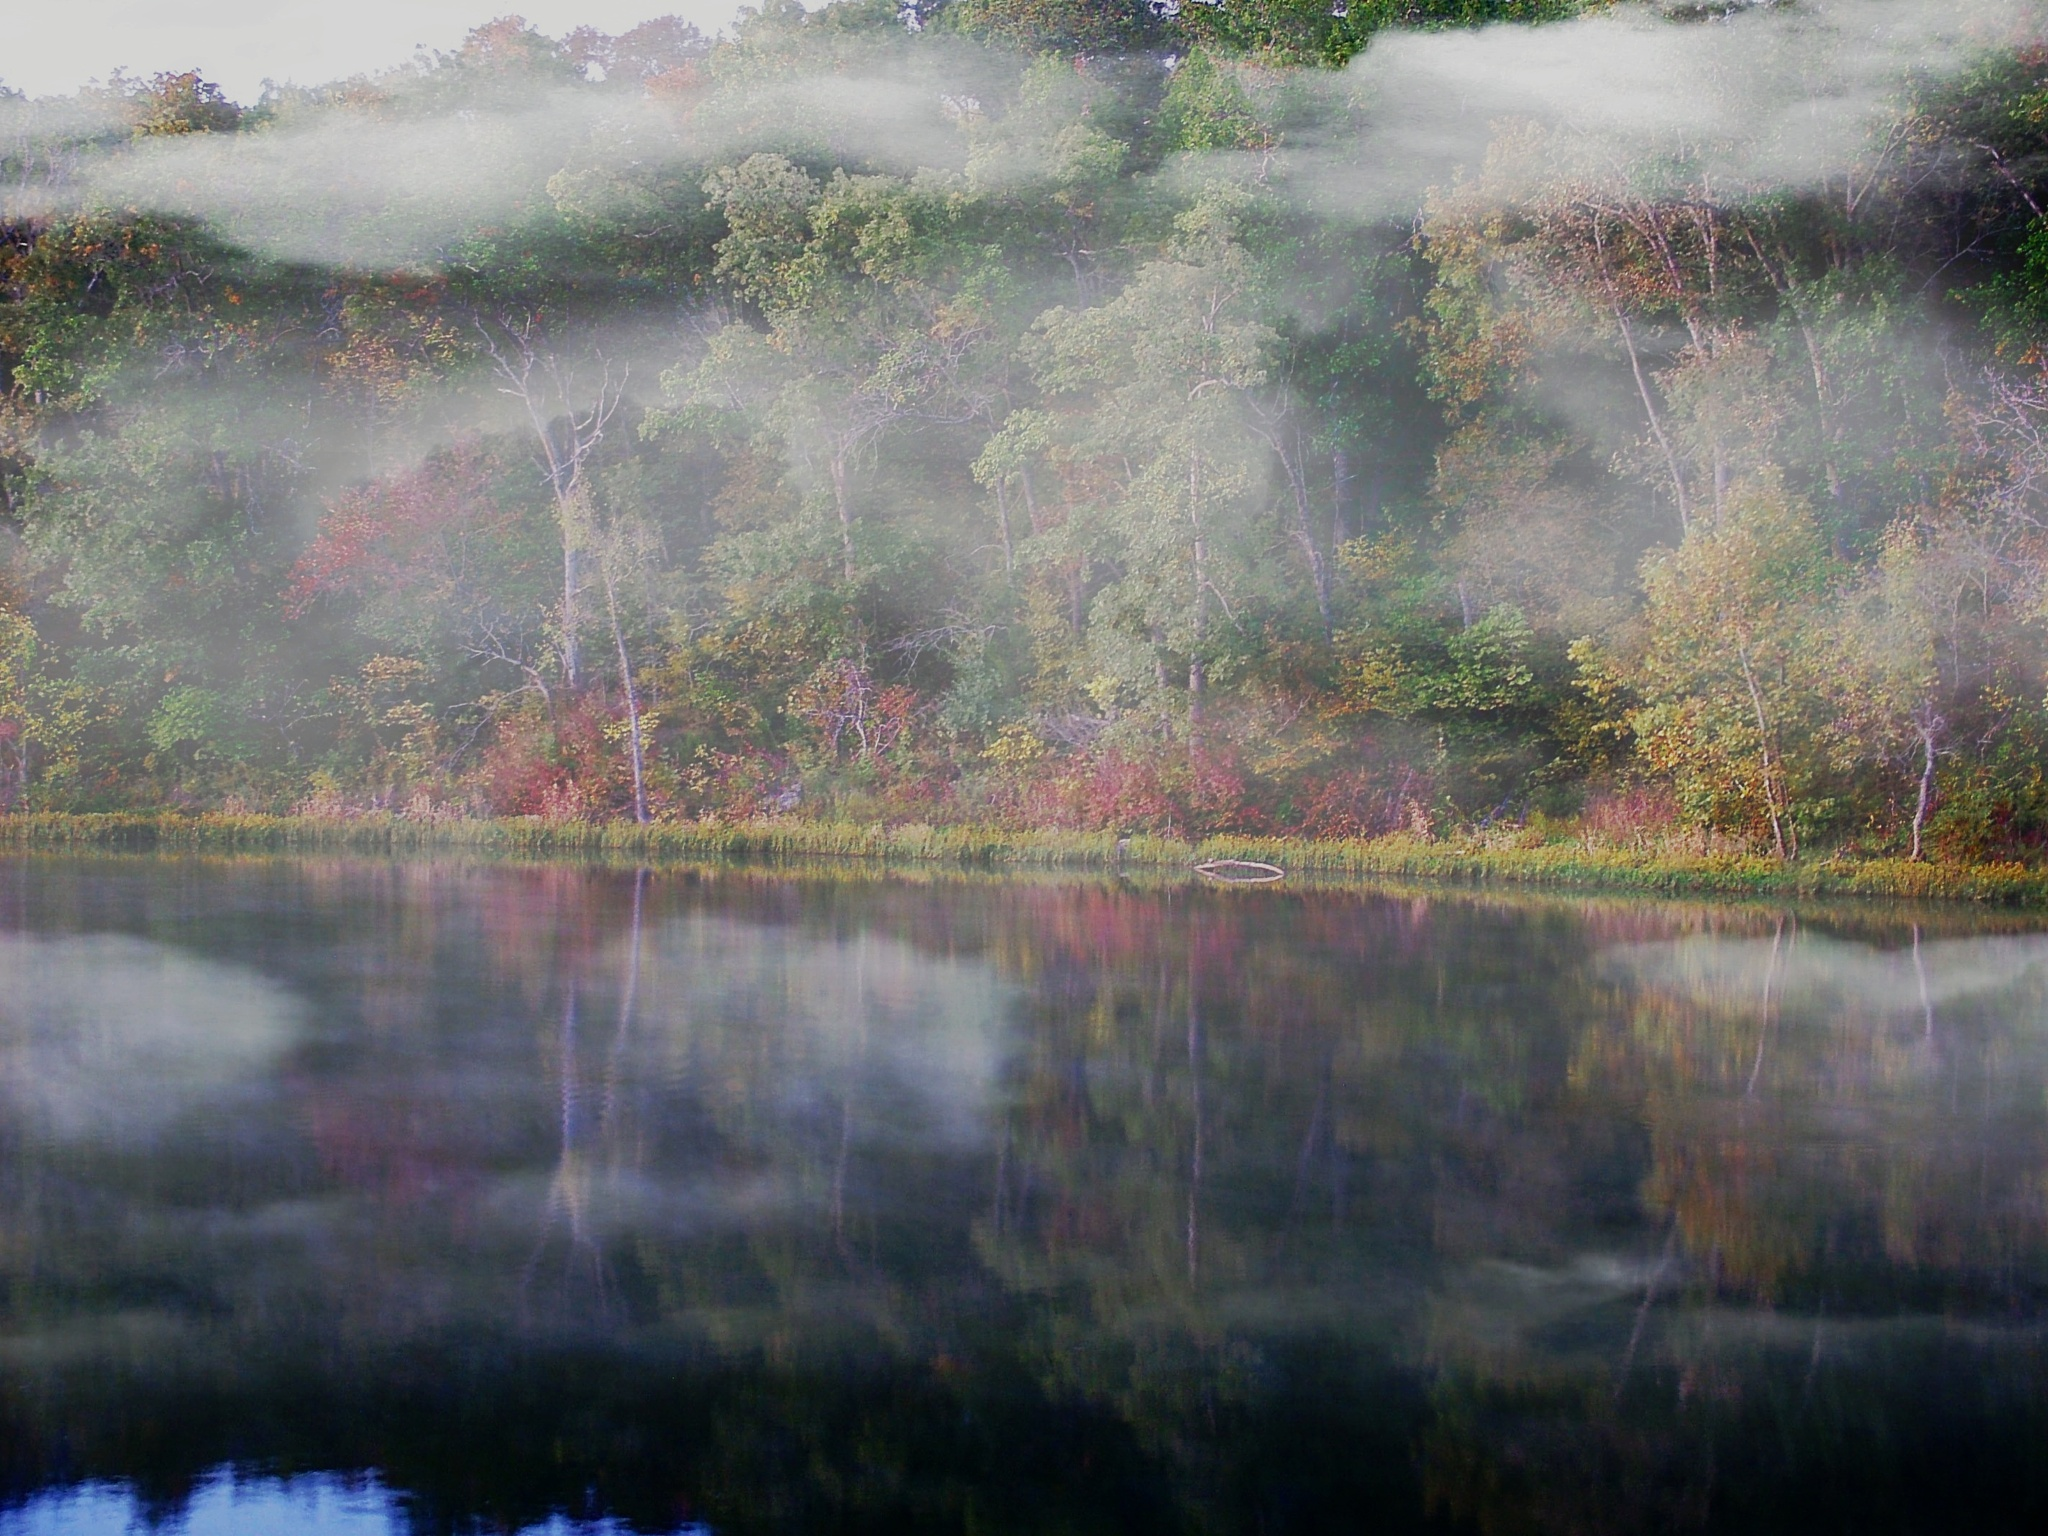 Early Morning Fog  by Lorenzo (Larry) Jonree